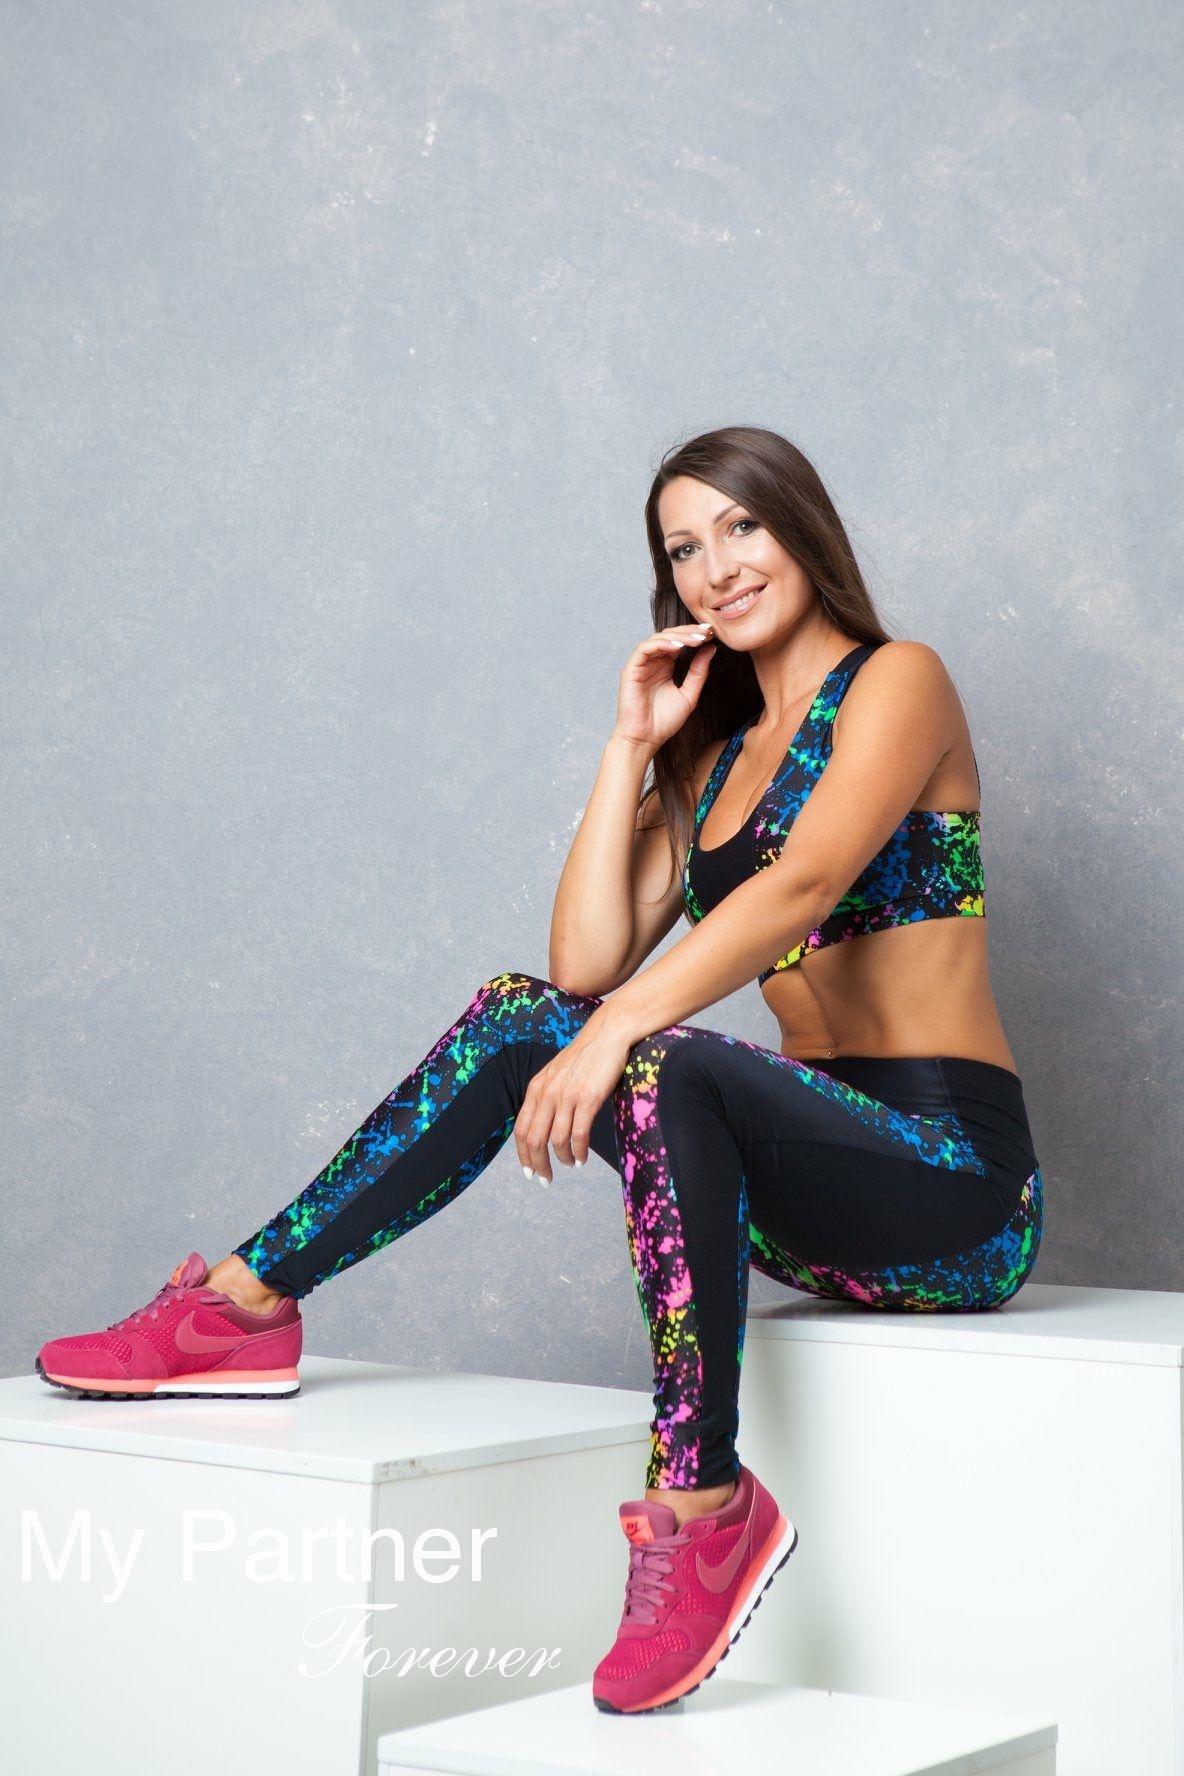 Datingsite to Meet Pretty Ukrainian Lady Yuliya from Vinnitsa, Ukraine